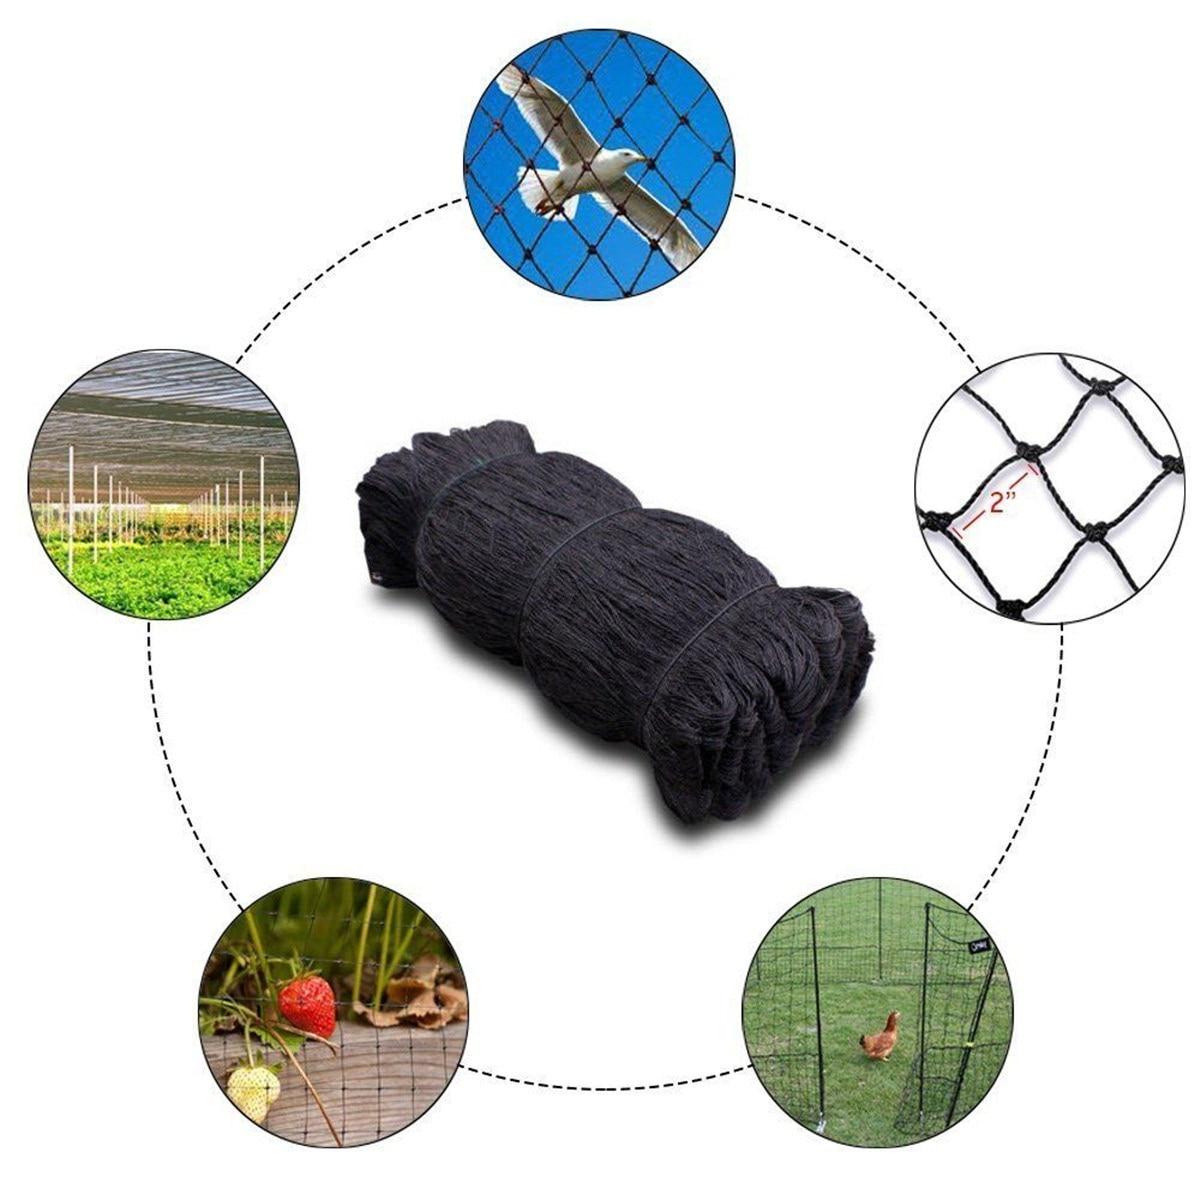 7 5 15M Plastic Anti Bird Netting Pond Net Protection Crops Fruit Tree Ve a